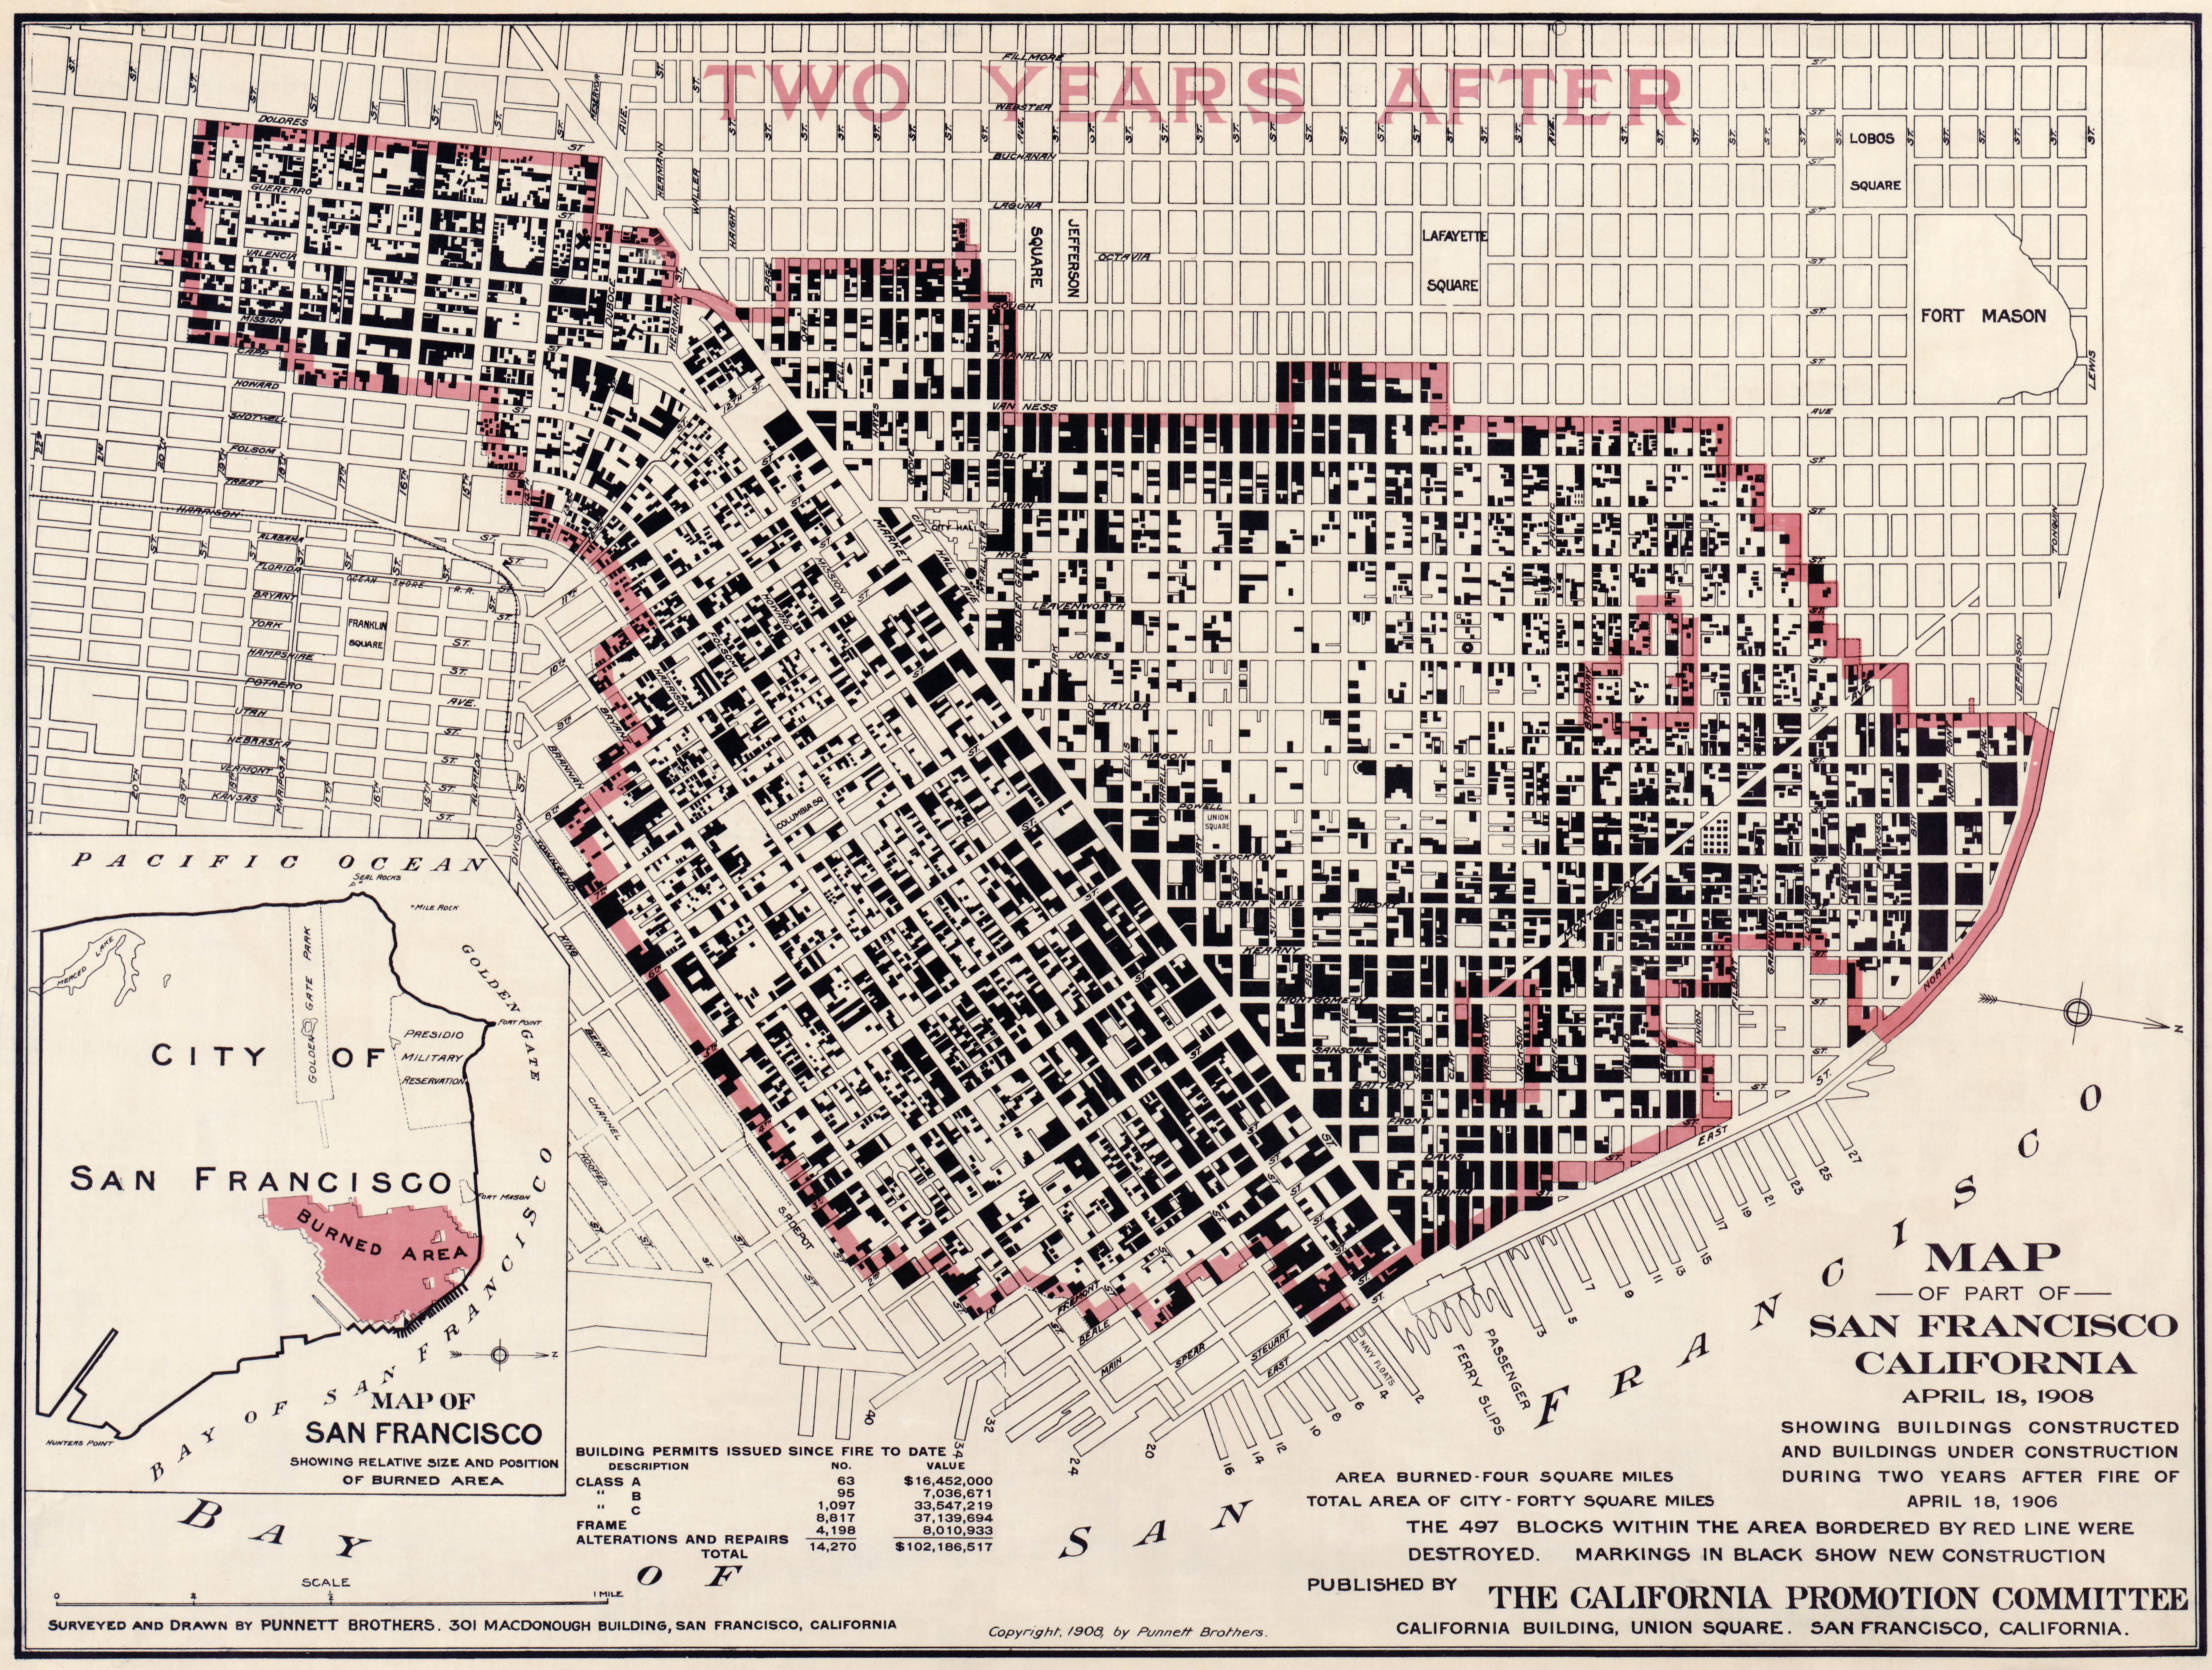 SAN FRANCISCO CALIFORNIA Fire Damage 1908